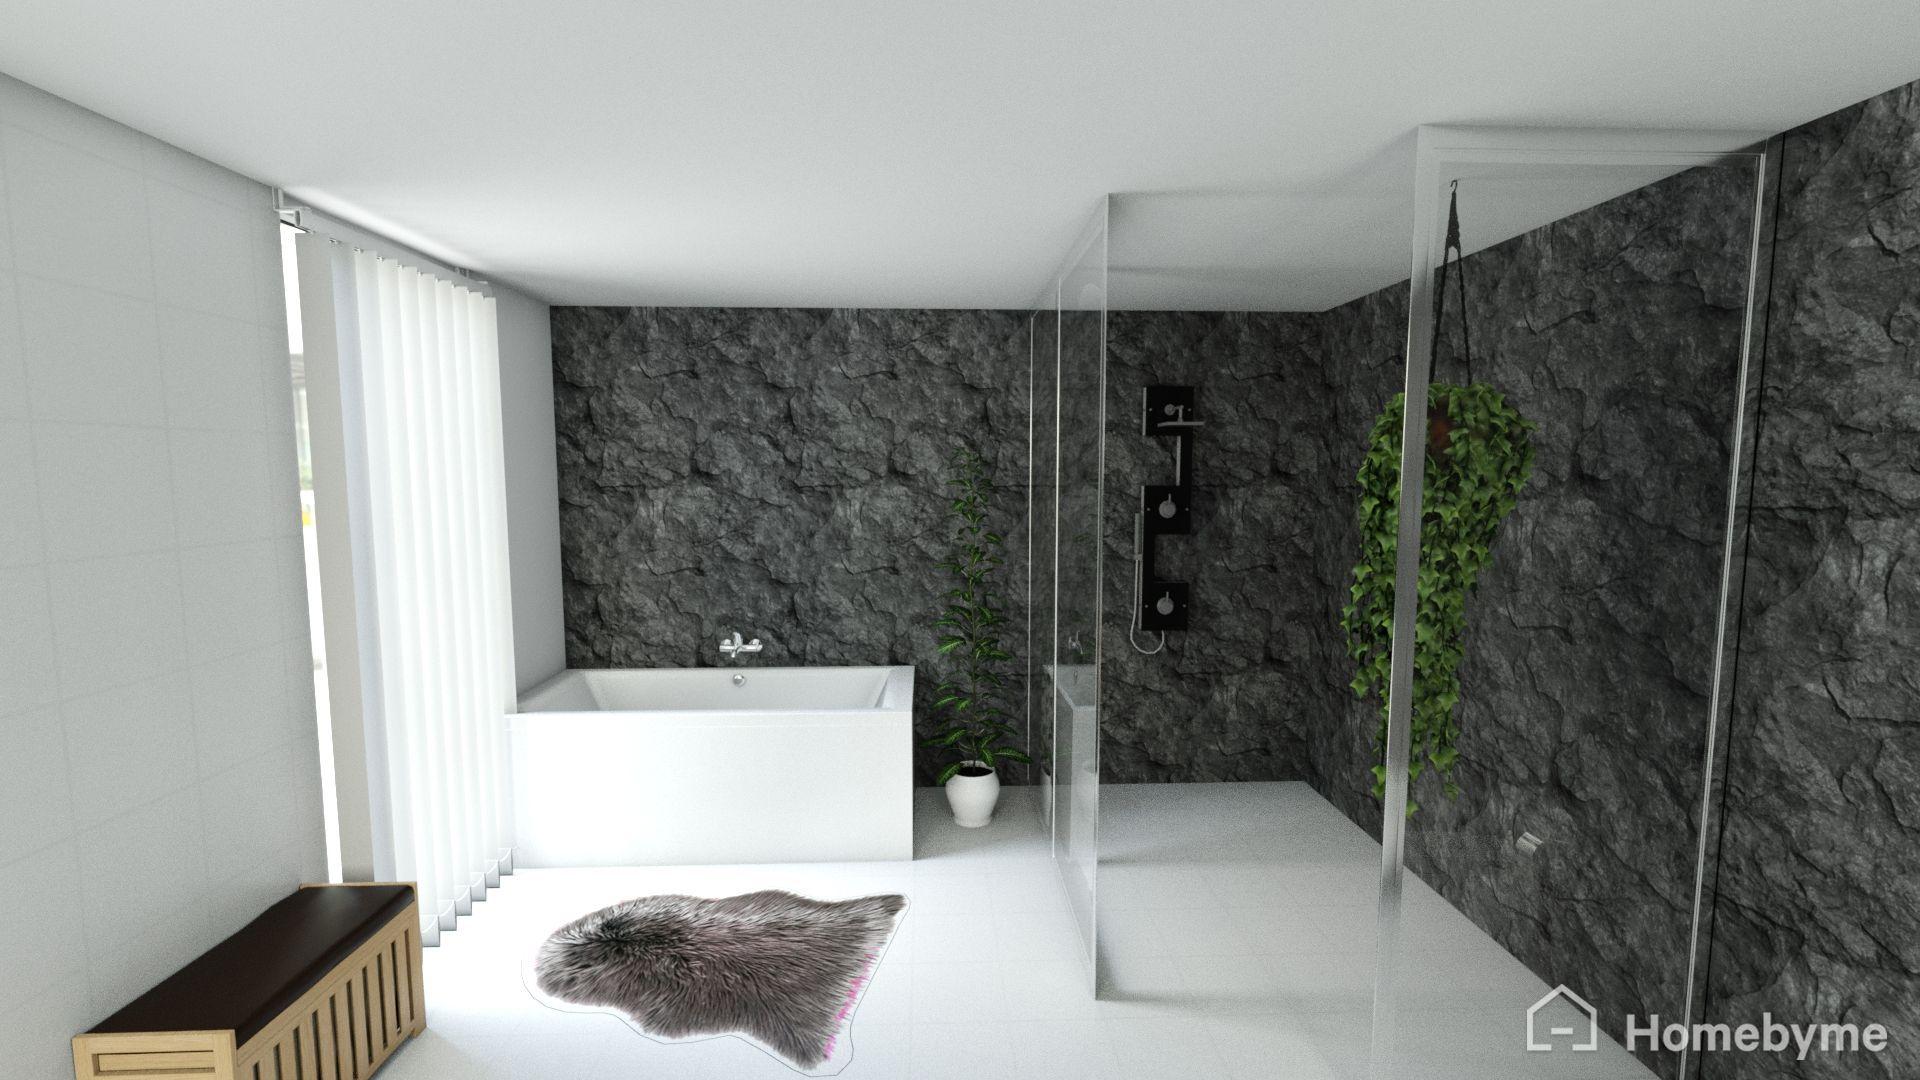 Badkamer Ontwerp Software : Badkamer ontwerp programma home by me art of interior